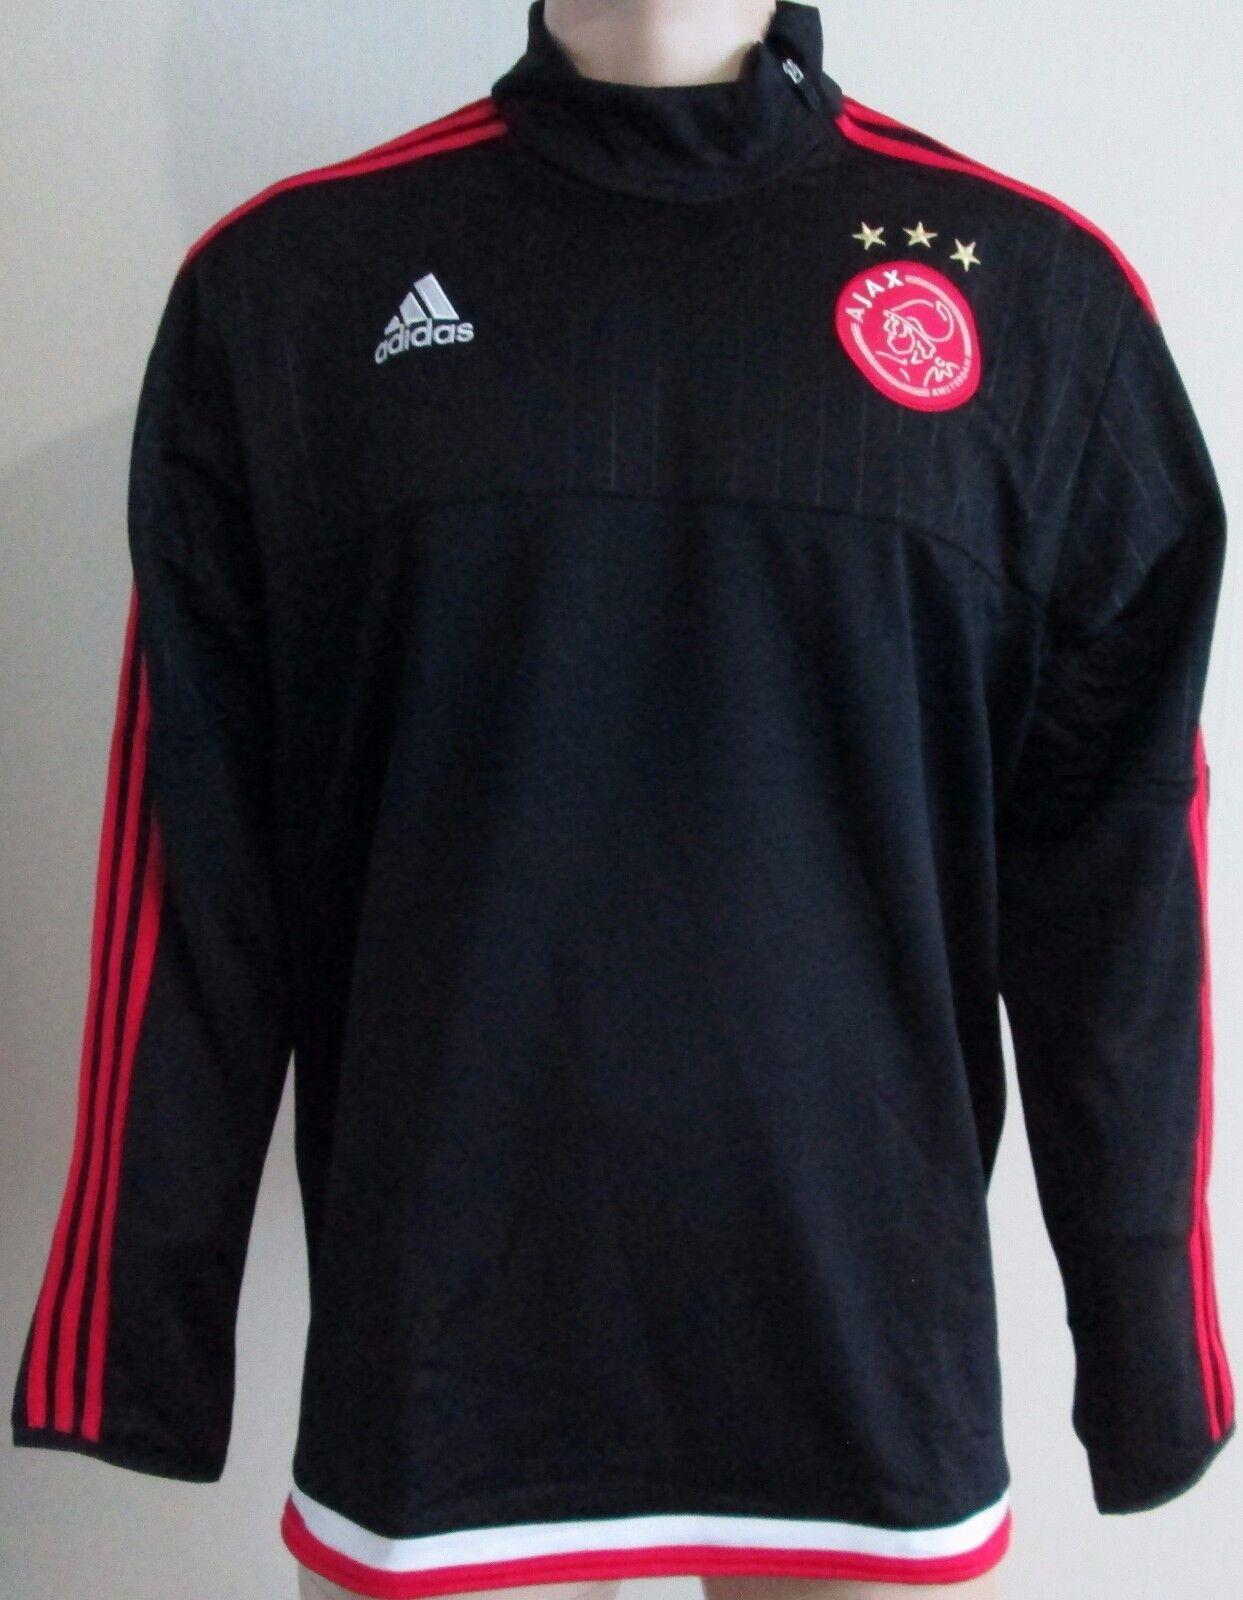 Men Ajax sweatshirt training top size XXL Adidas BNWT